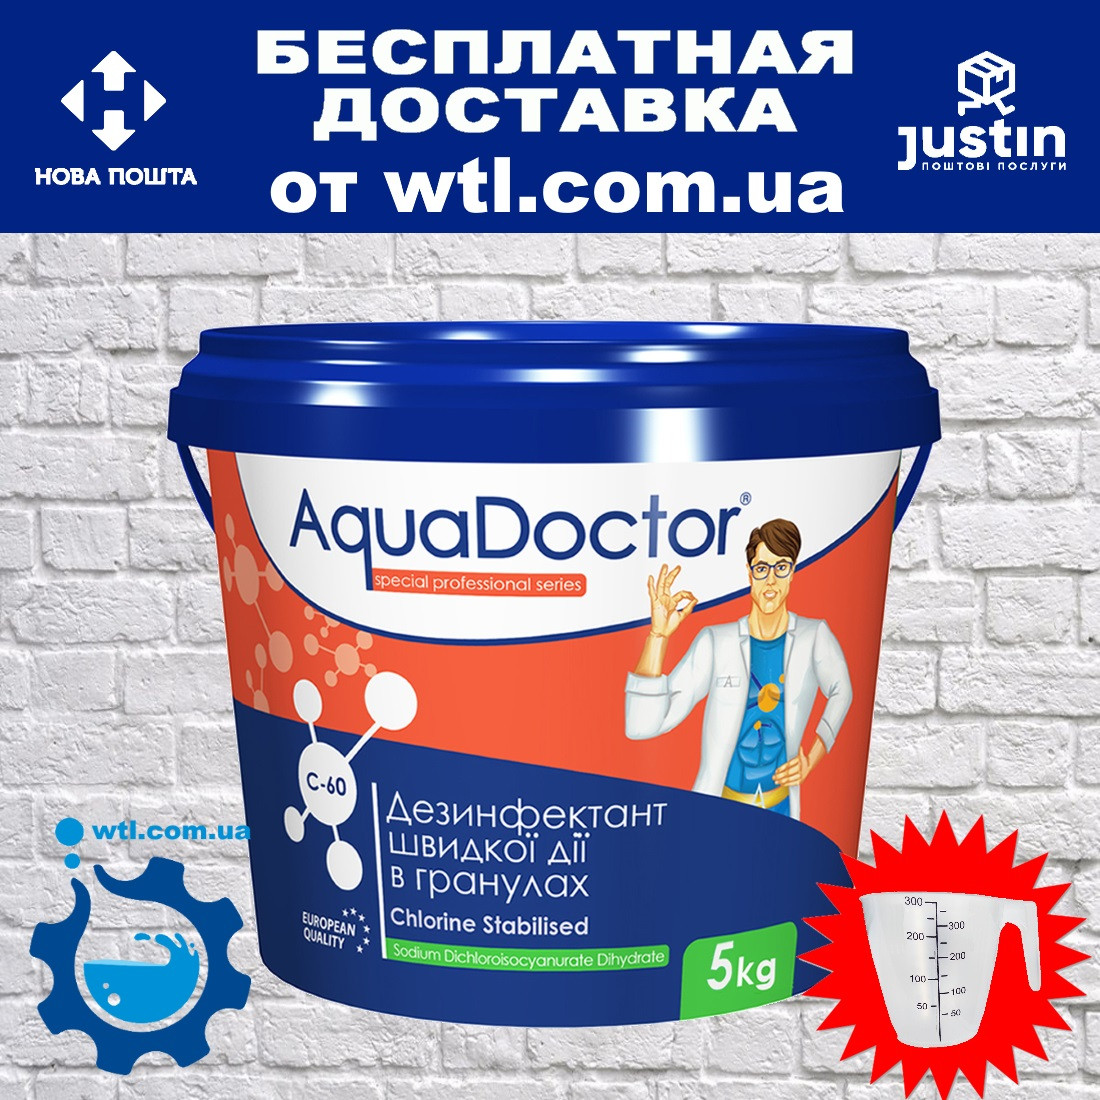 AquaDoctor C-60 5 кг ГРАНУЛЫ. Шок хлор, быстрый хлор. Химия для бассейнов Аквадоктор